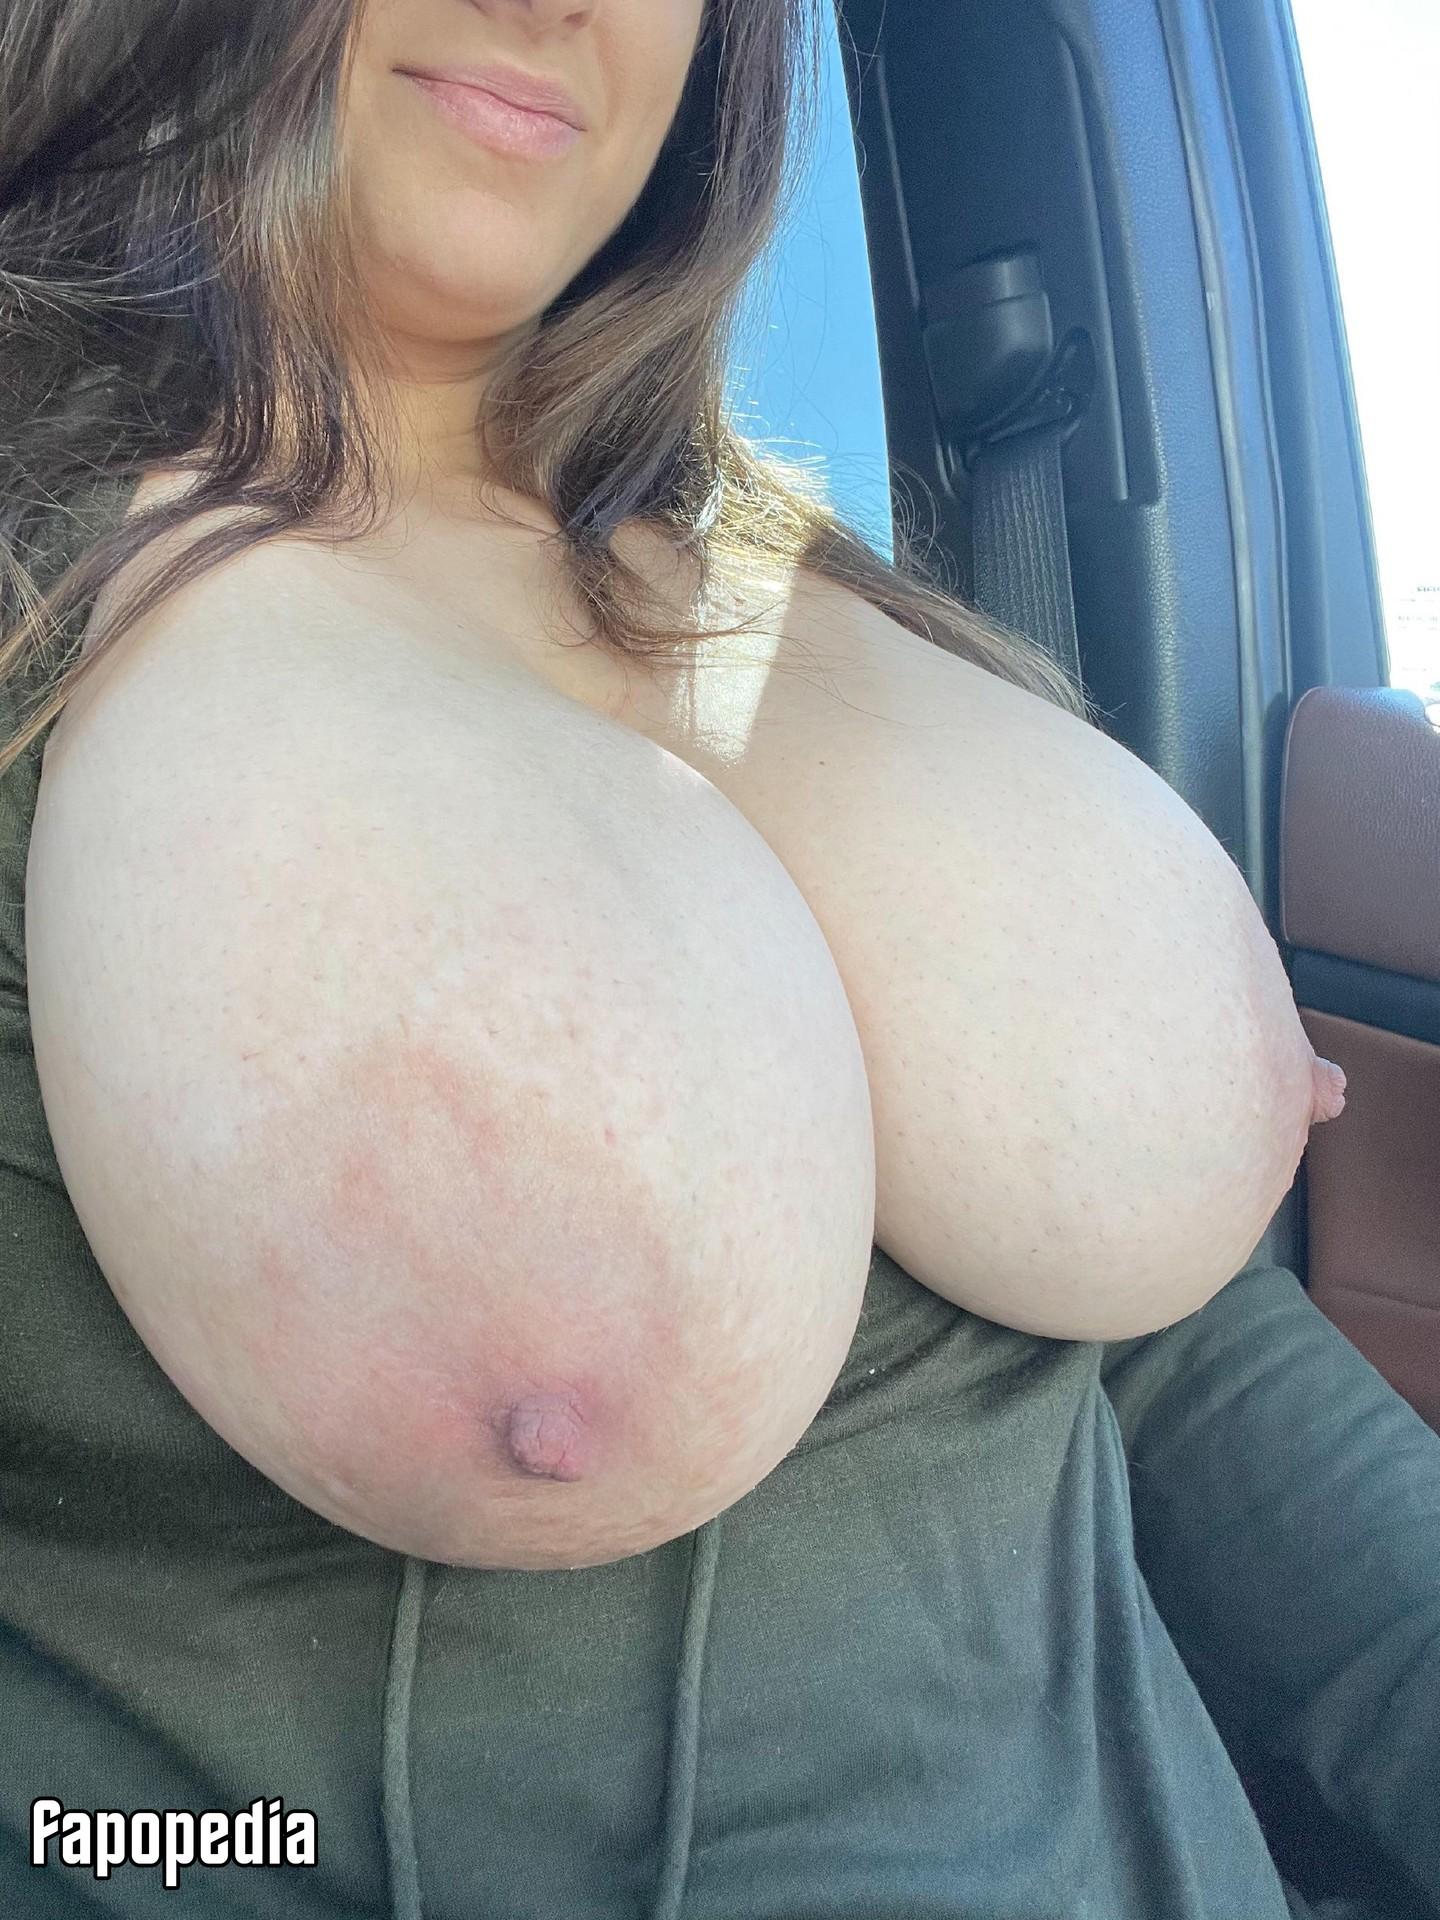 NoExamination2854 Nude Leaks